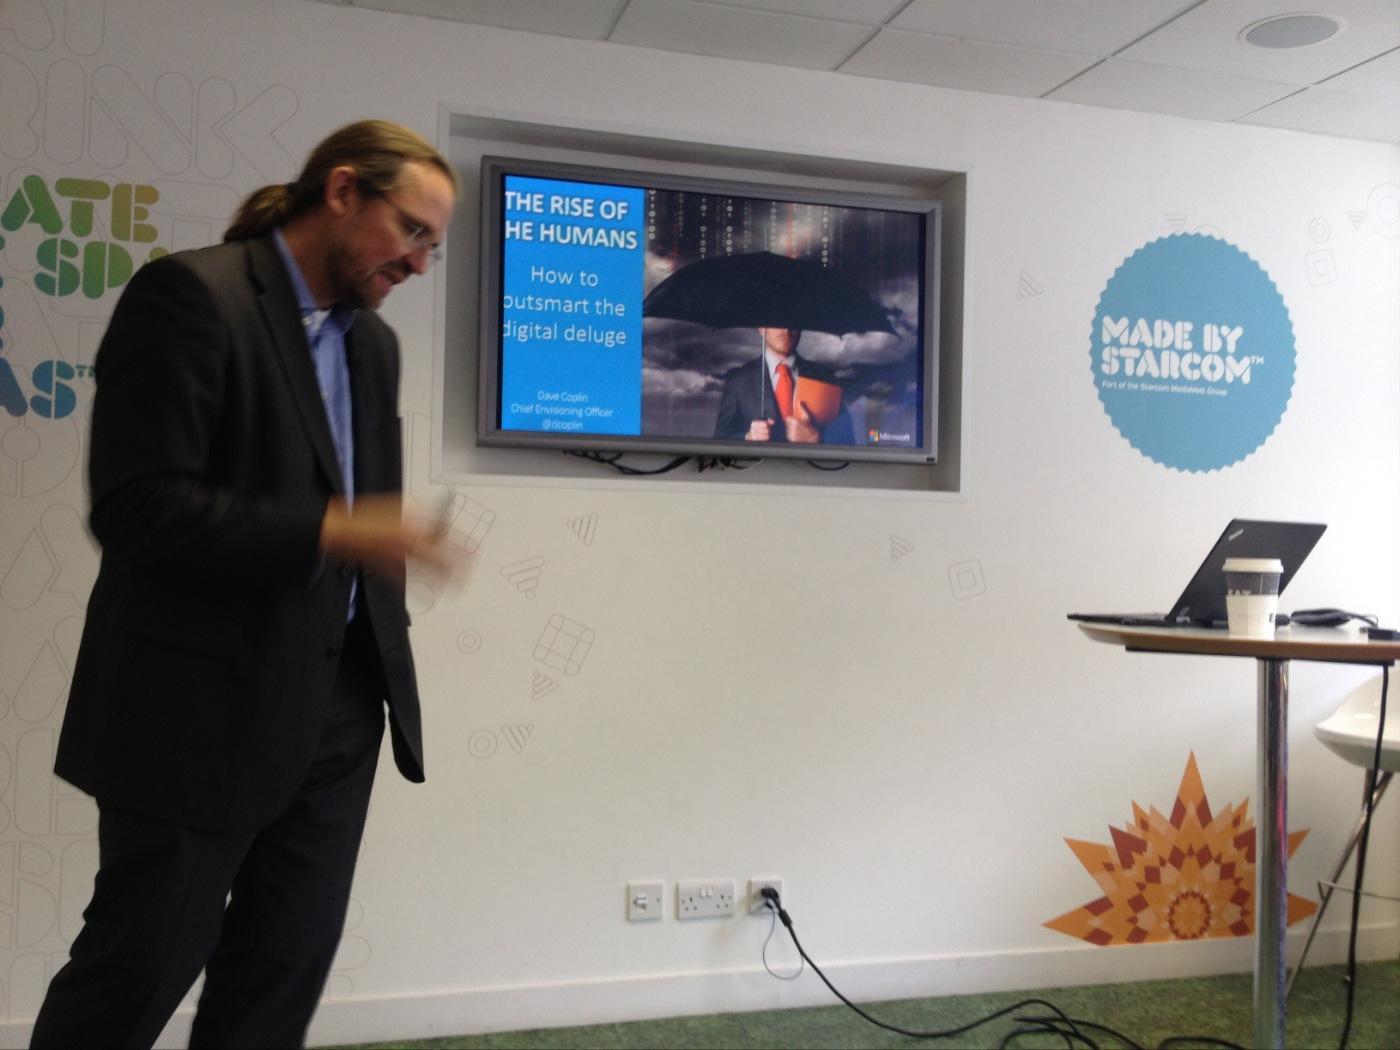 Dave Coplin (@dcoplin) Chief Envisioning Officer @MicrosoftUK is here for #SMGBeyondDigital! http://t.co/giW9L7vamk